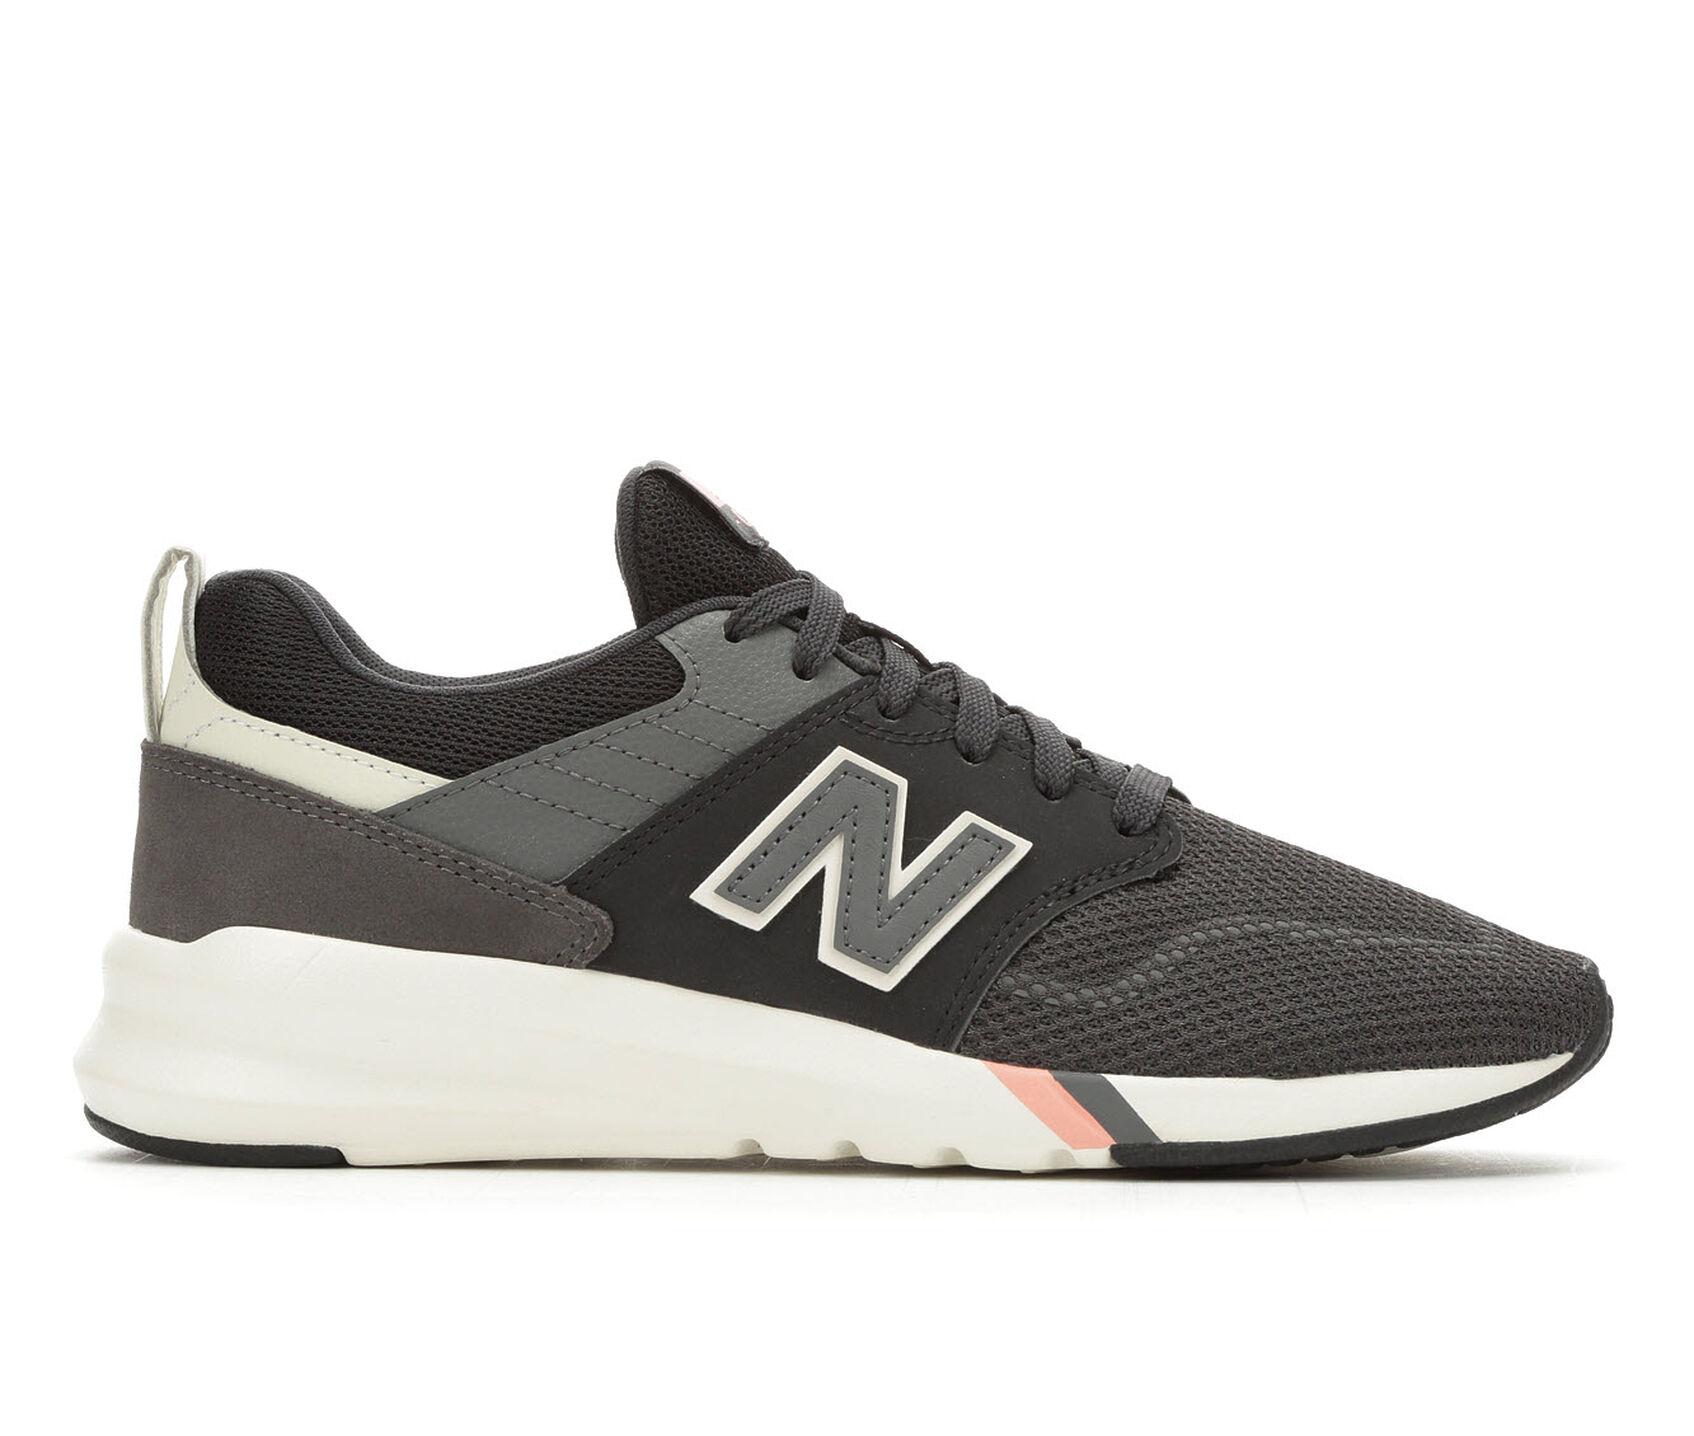 1b40d633229c2 Women's New Balance 009 Retro Sneakers | Shoe Carnival